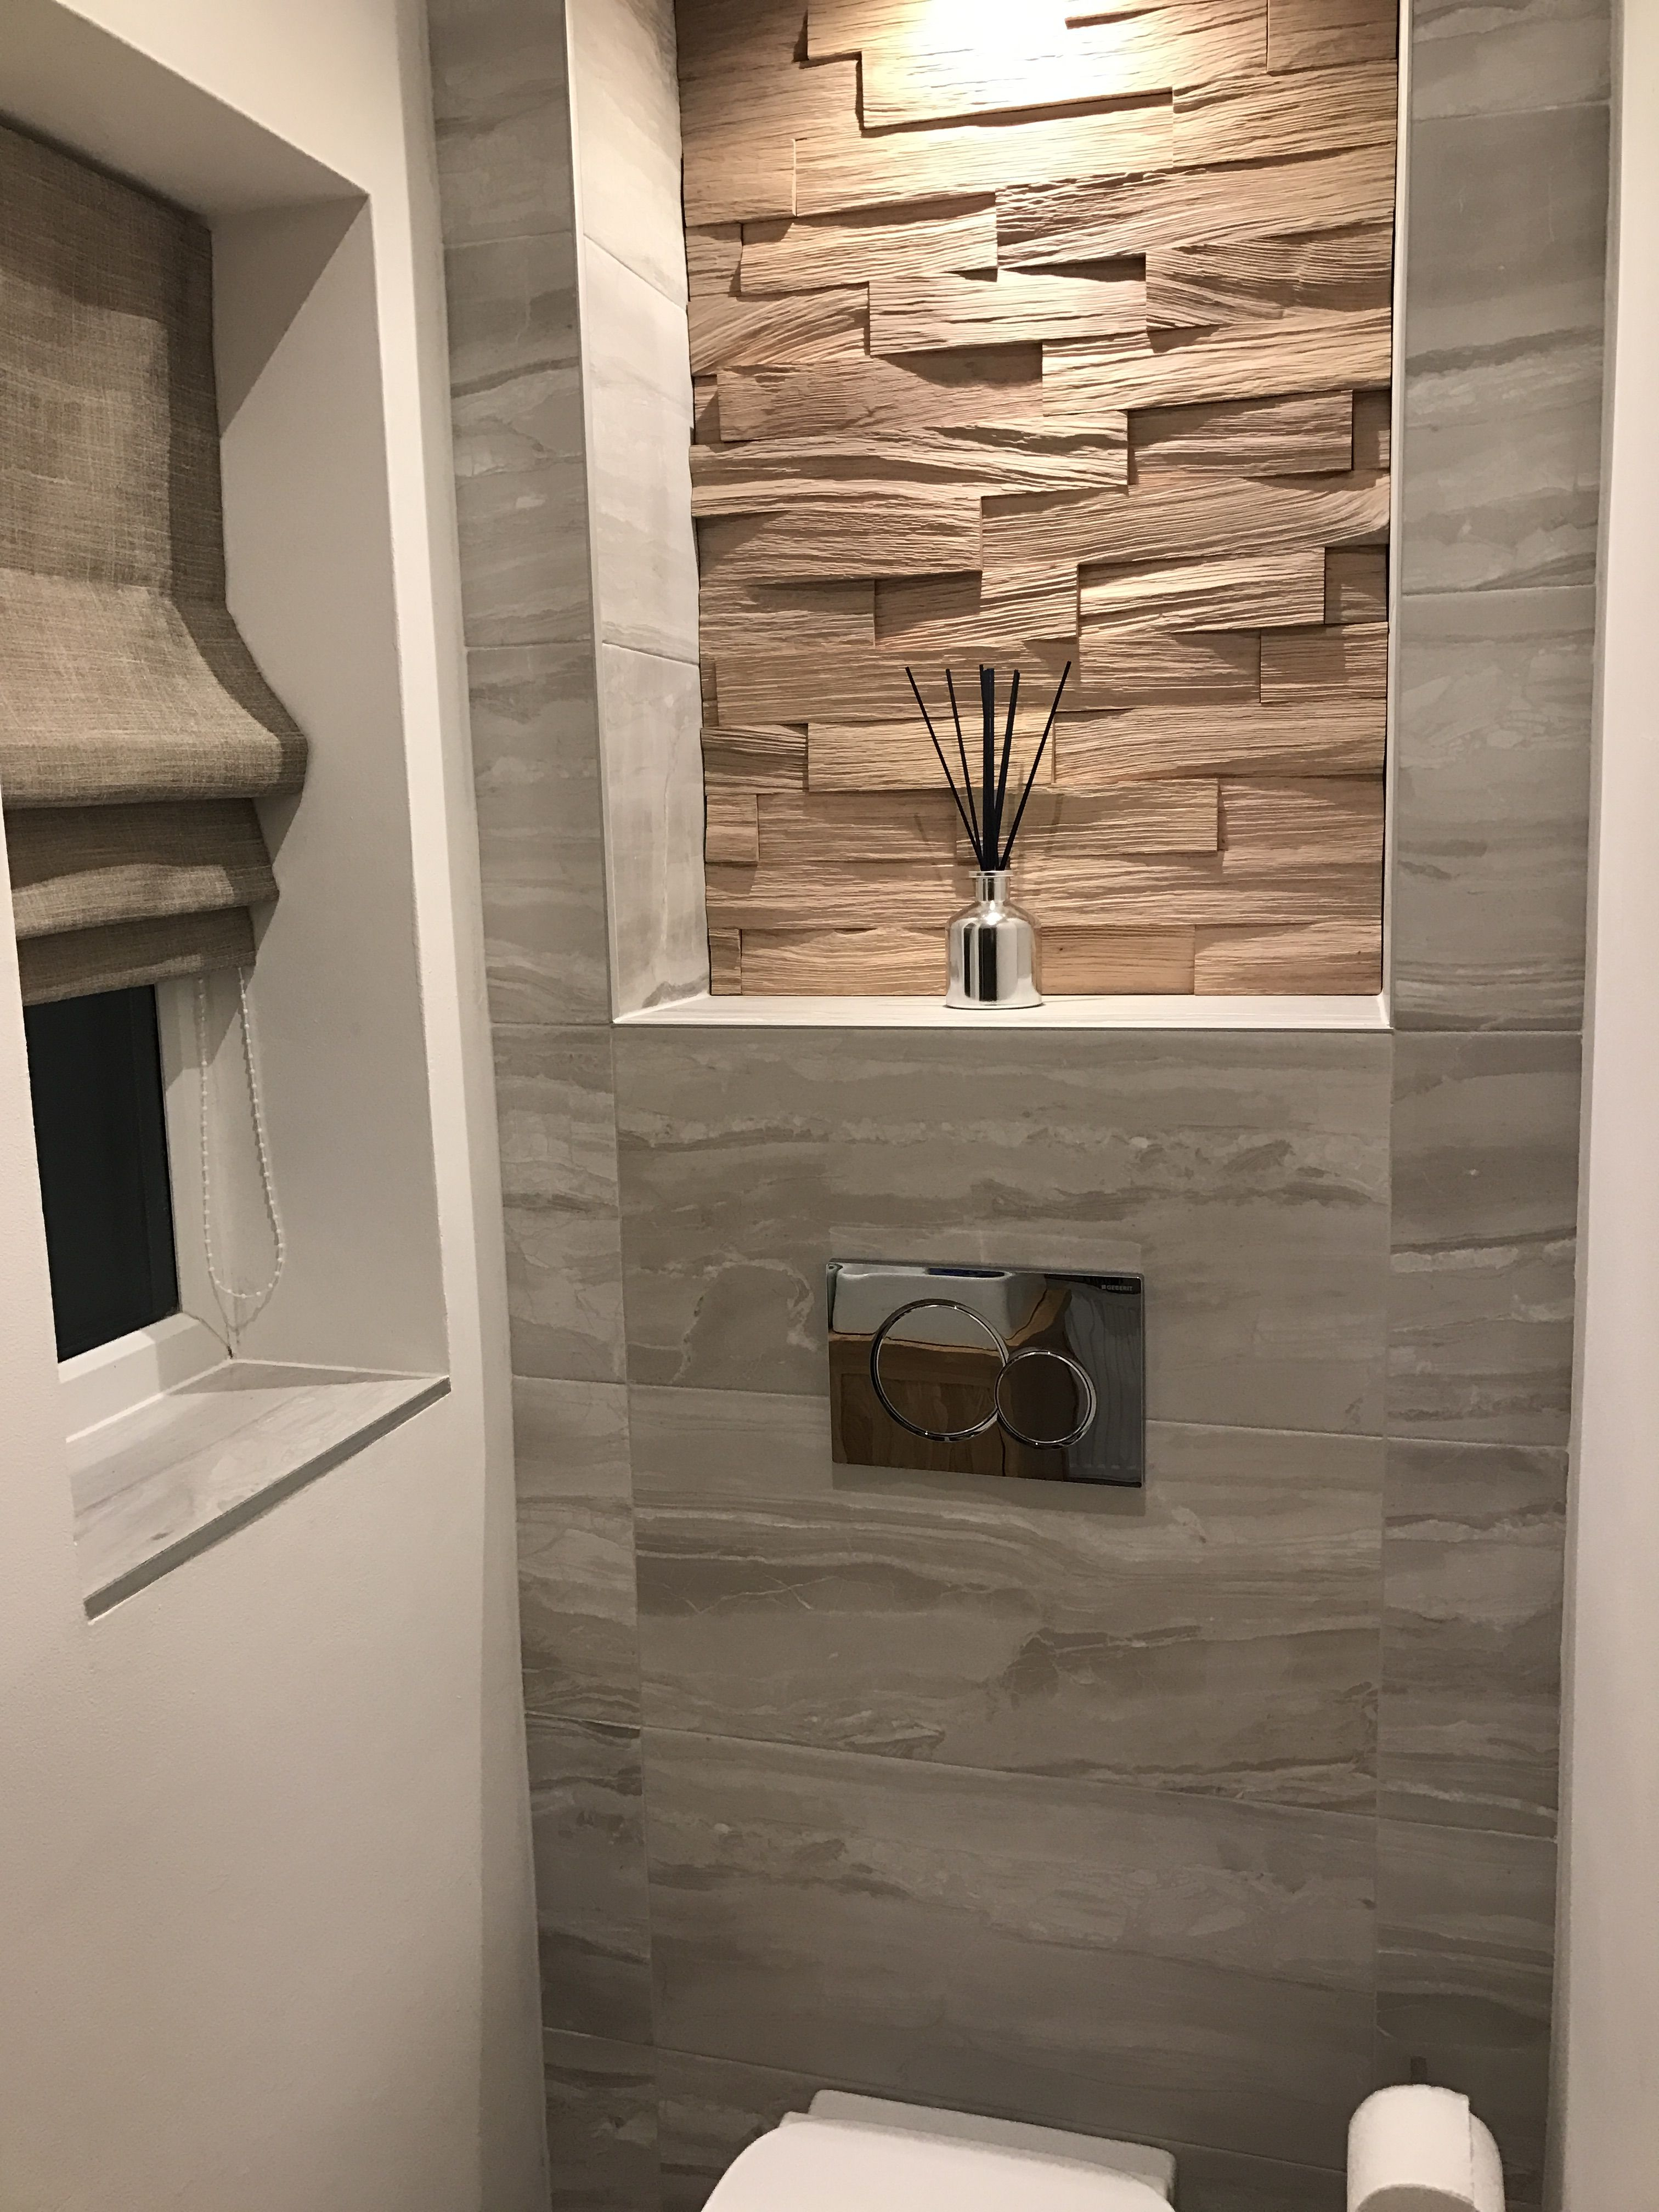 Porcelanosa Wood Wall Pure Tiles Mixed With B&q Tiles  Ideas For Captivating B&q Bathroom Design Decorating Design